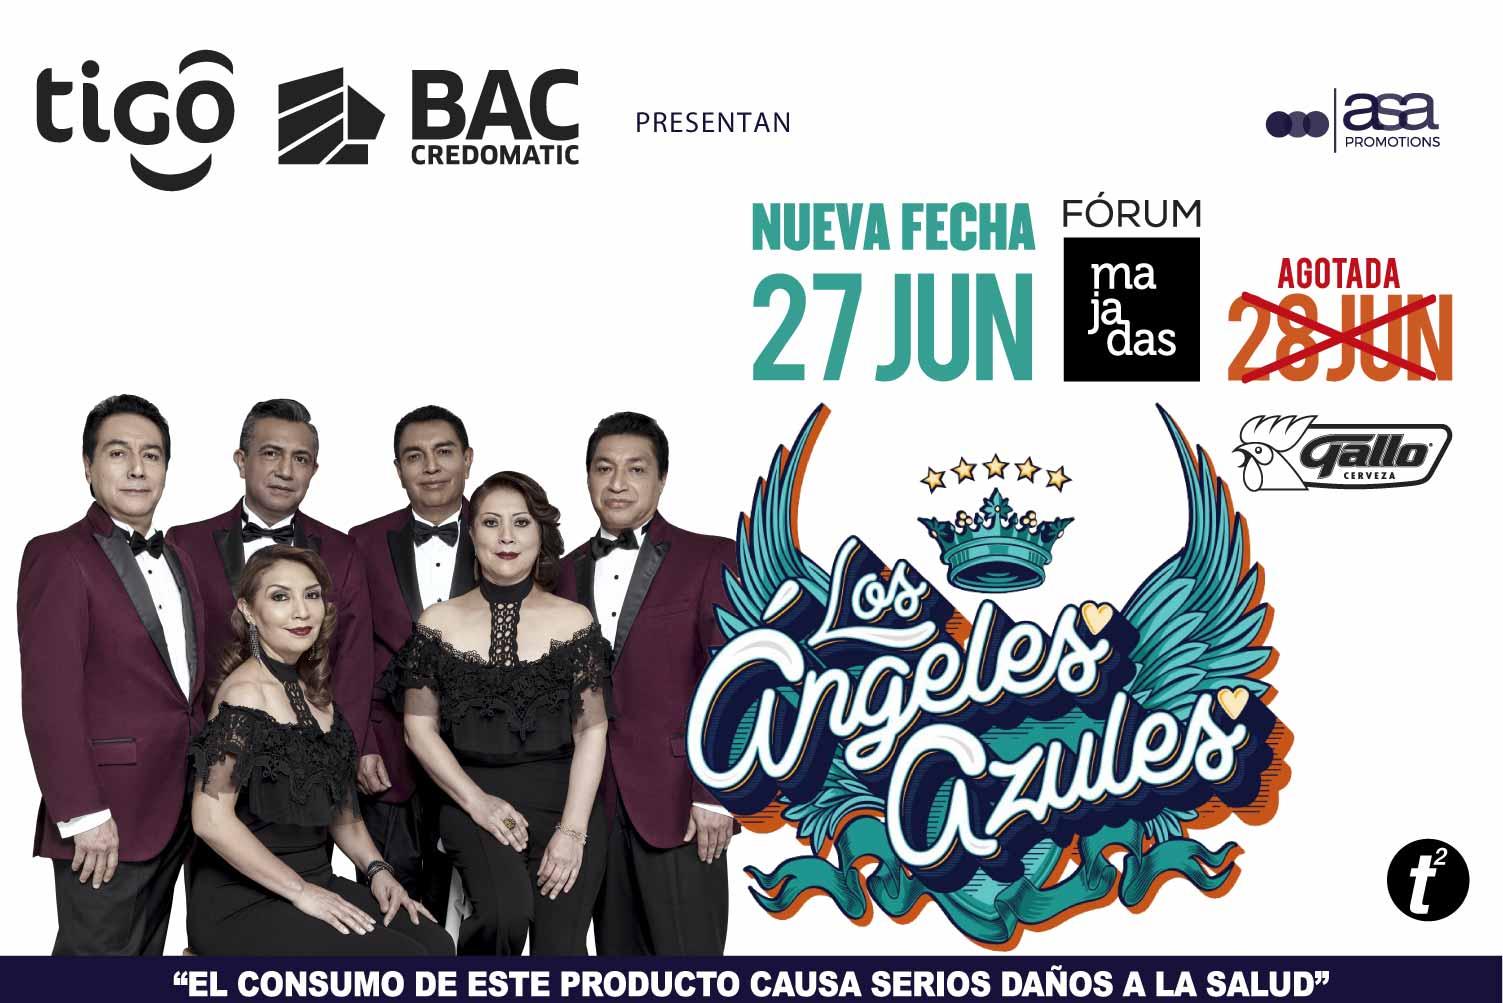 Angeles azules en Guatemala